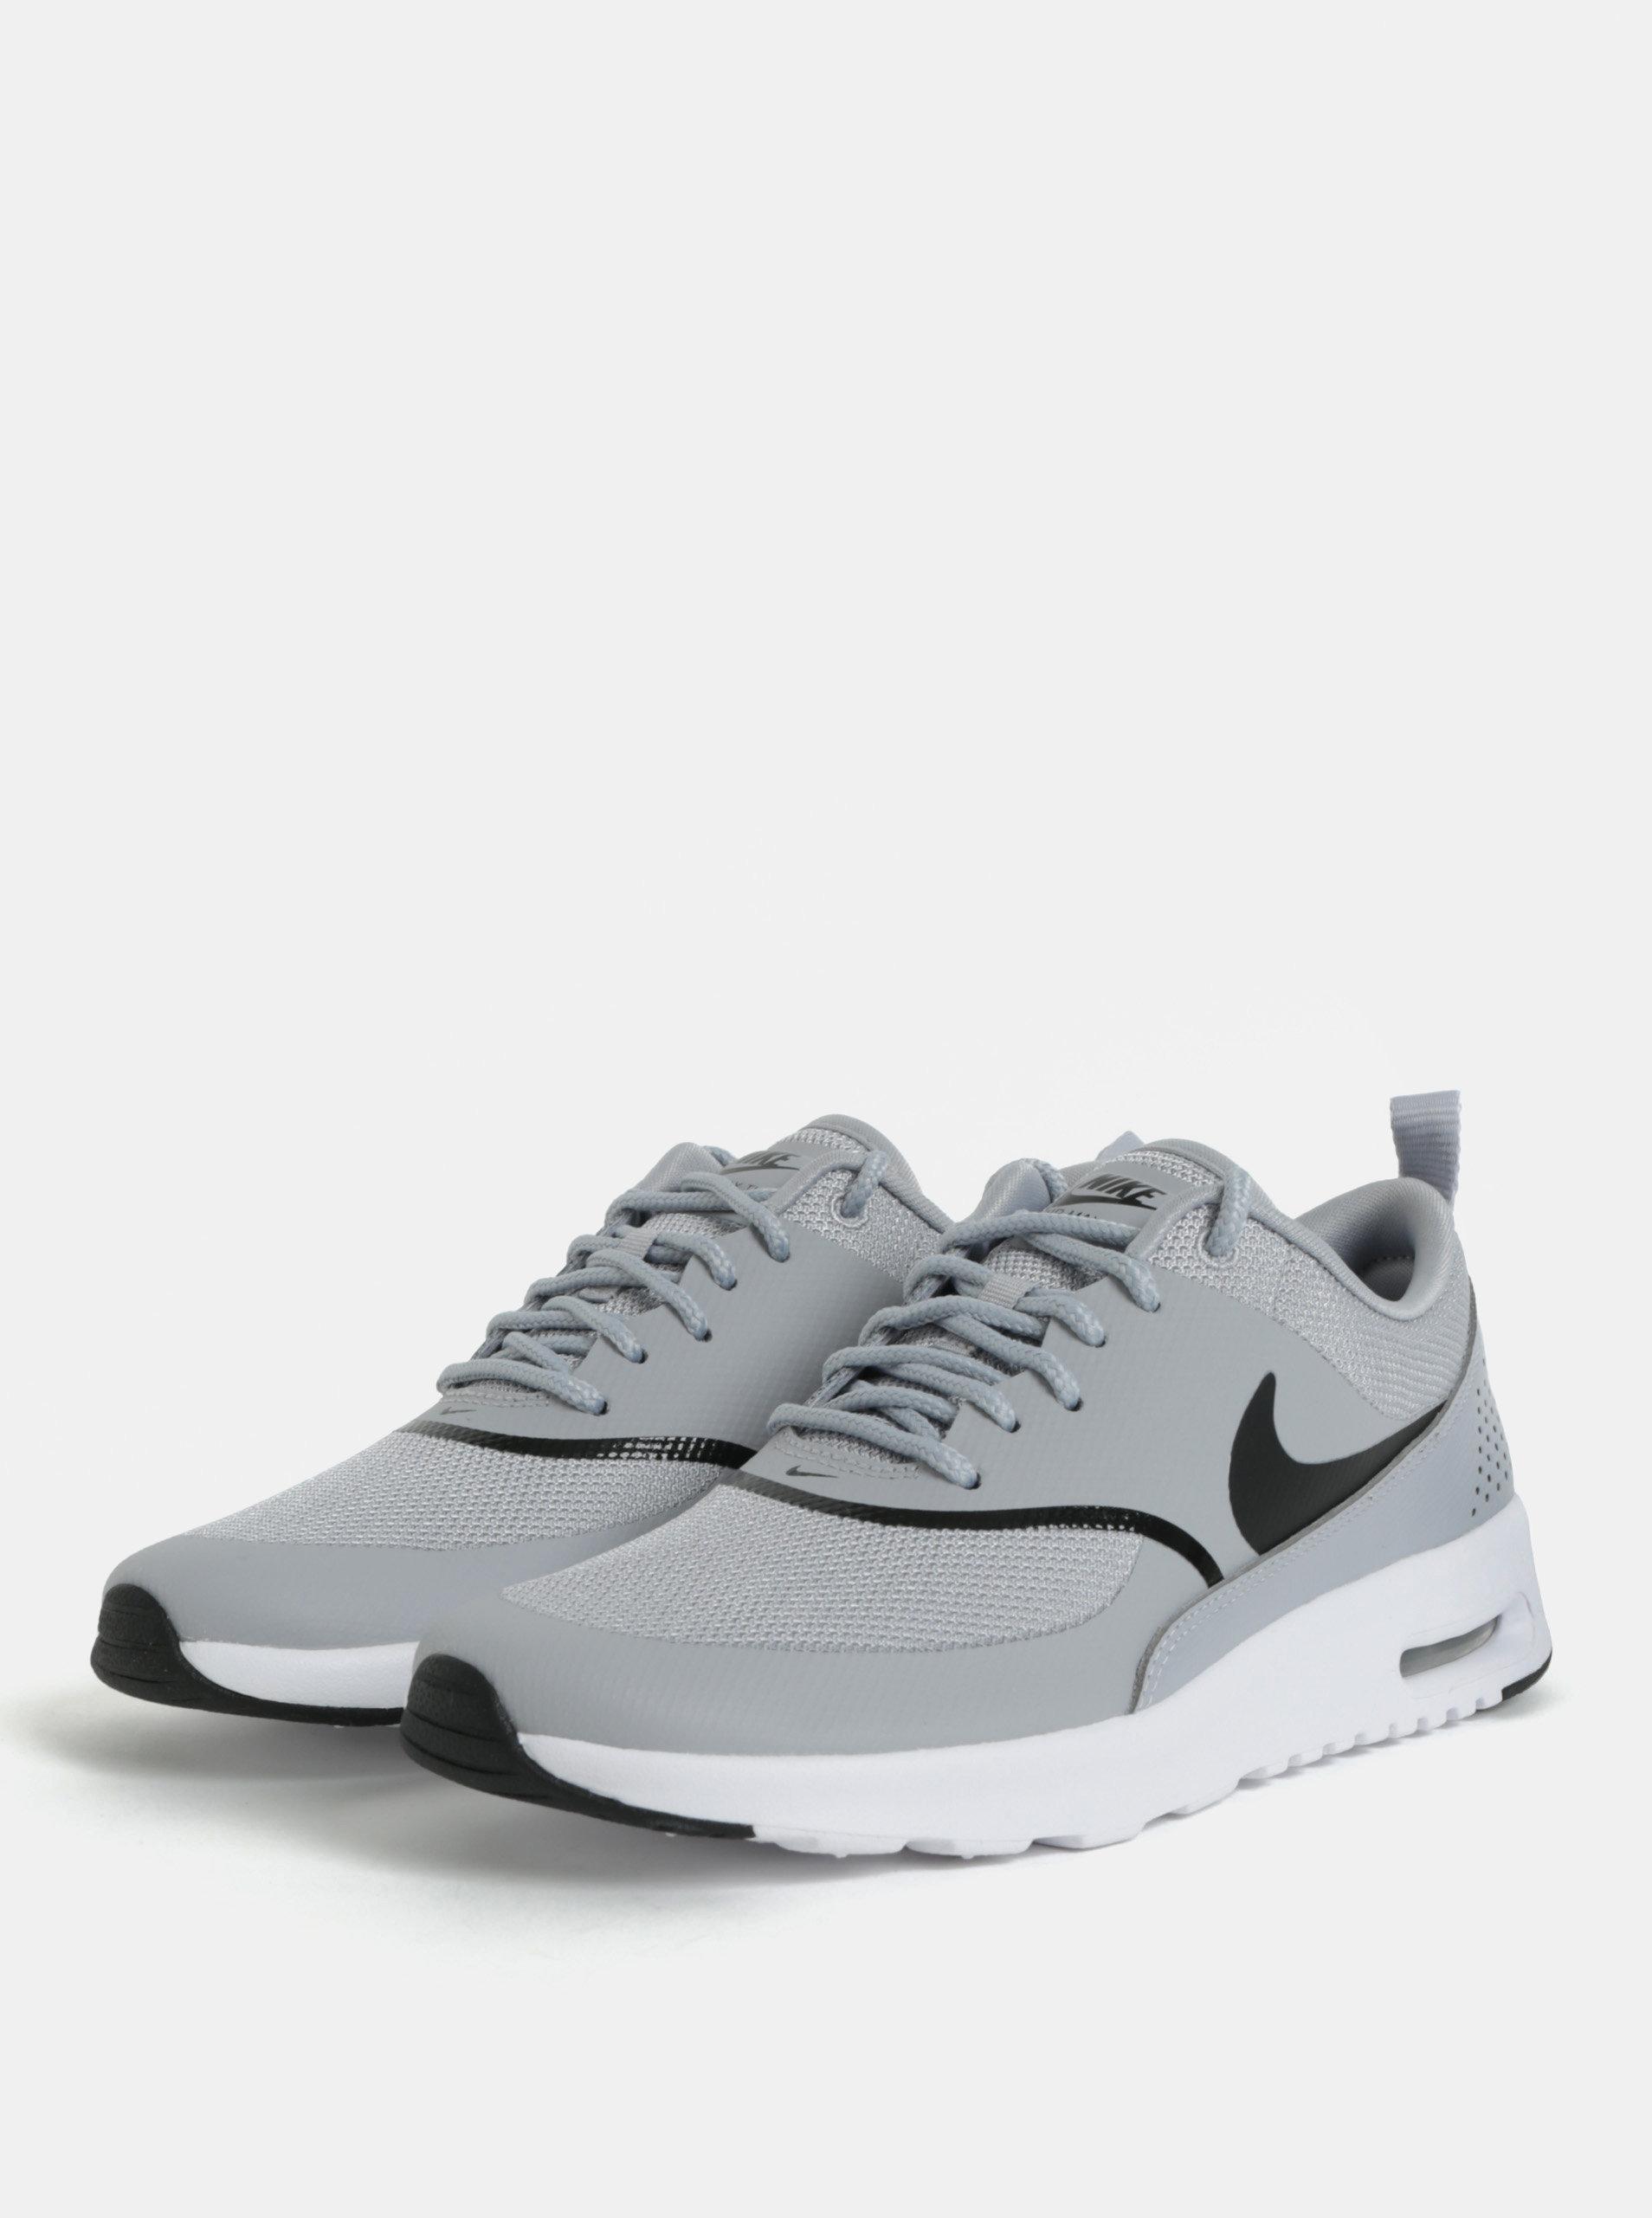 Sivé dámske tenisky Nike Air Max Thea ... fb4b2c89df9